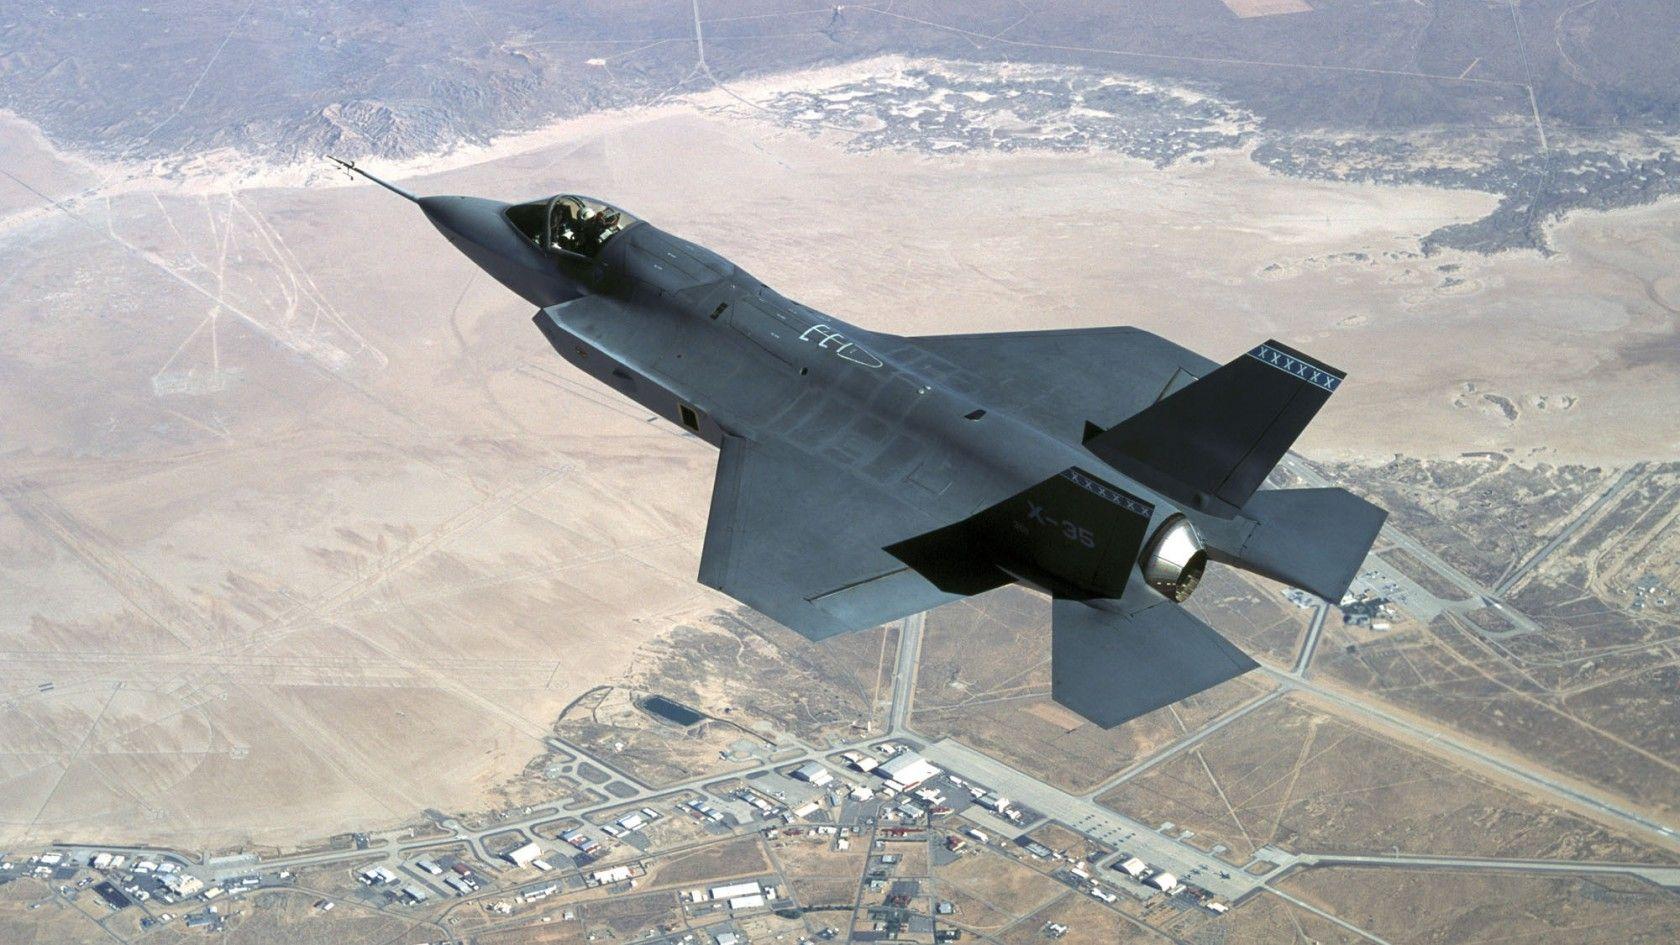 X35 Lightning II Stealth aircraft, Fighter aircraft